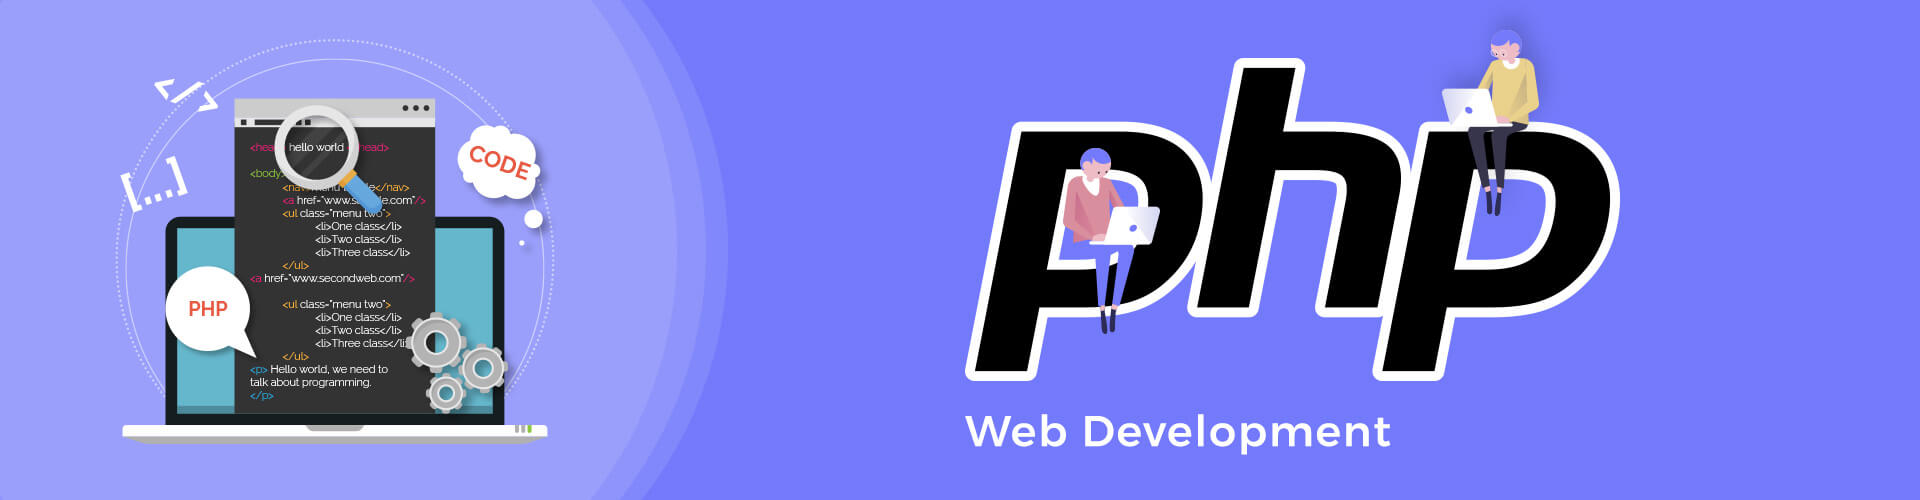 Best PHP Ecommerce Website Development Company Web Design Services Agency Mint Media